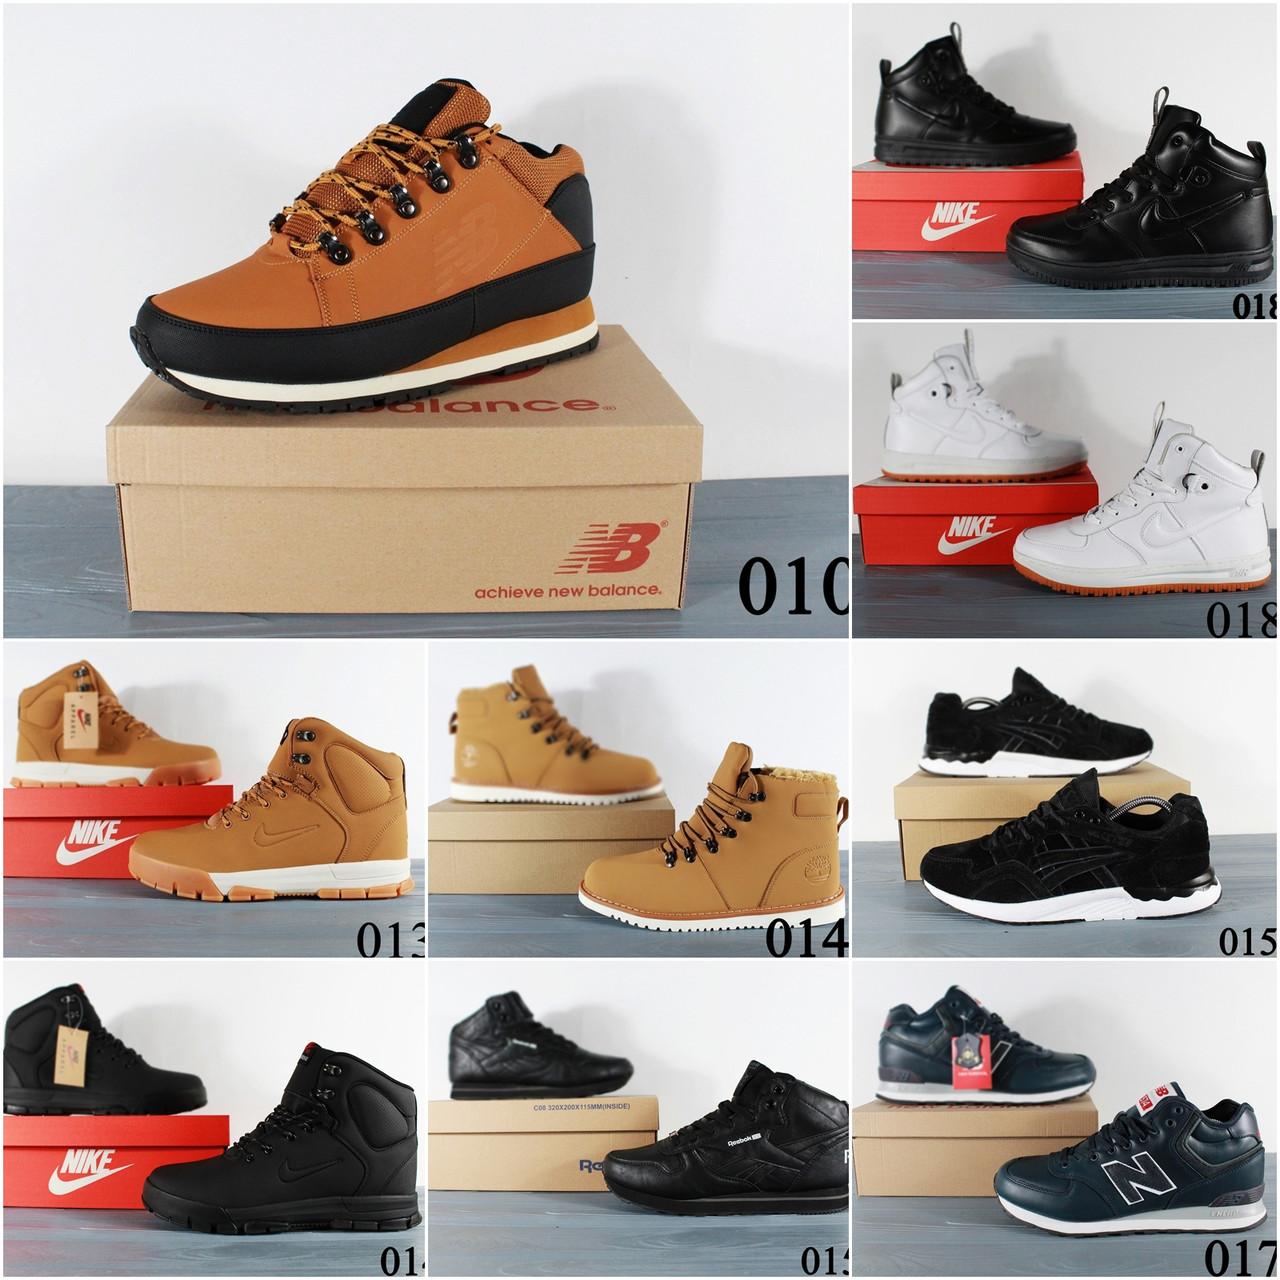 Распродажа зимней мужской обуви СУПЕР ЦЕНА